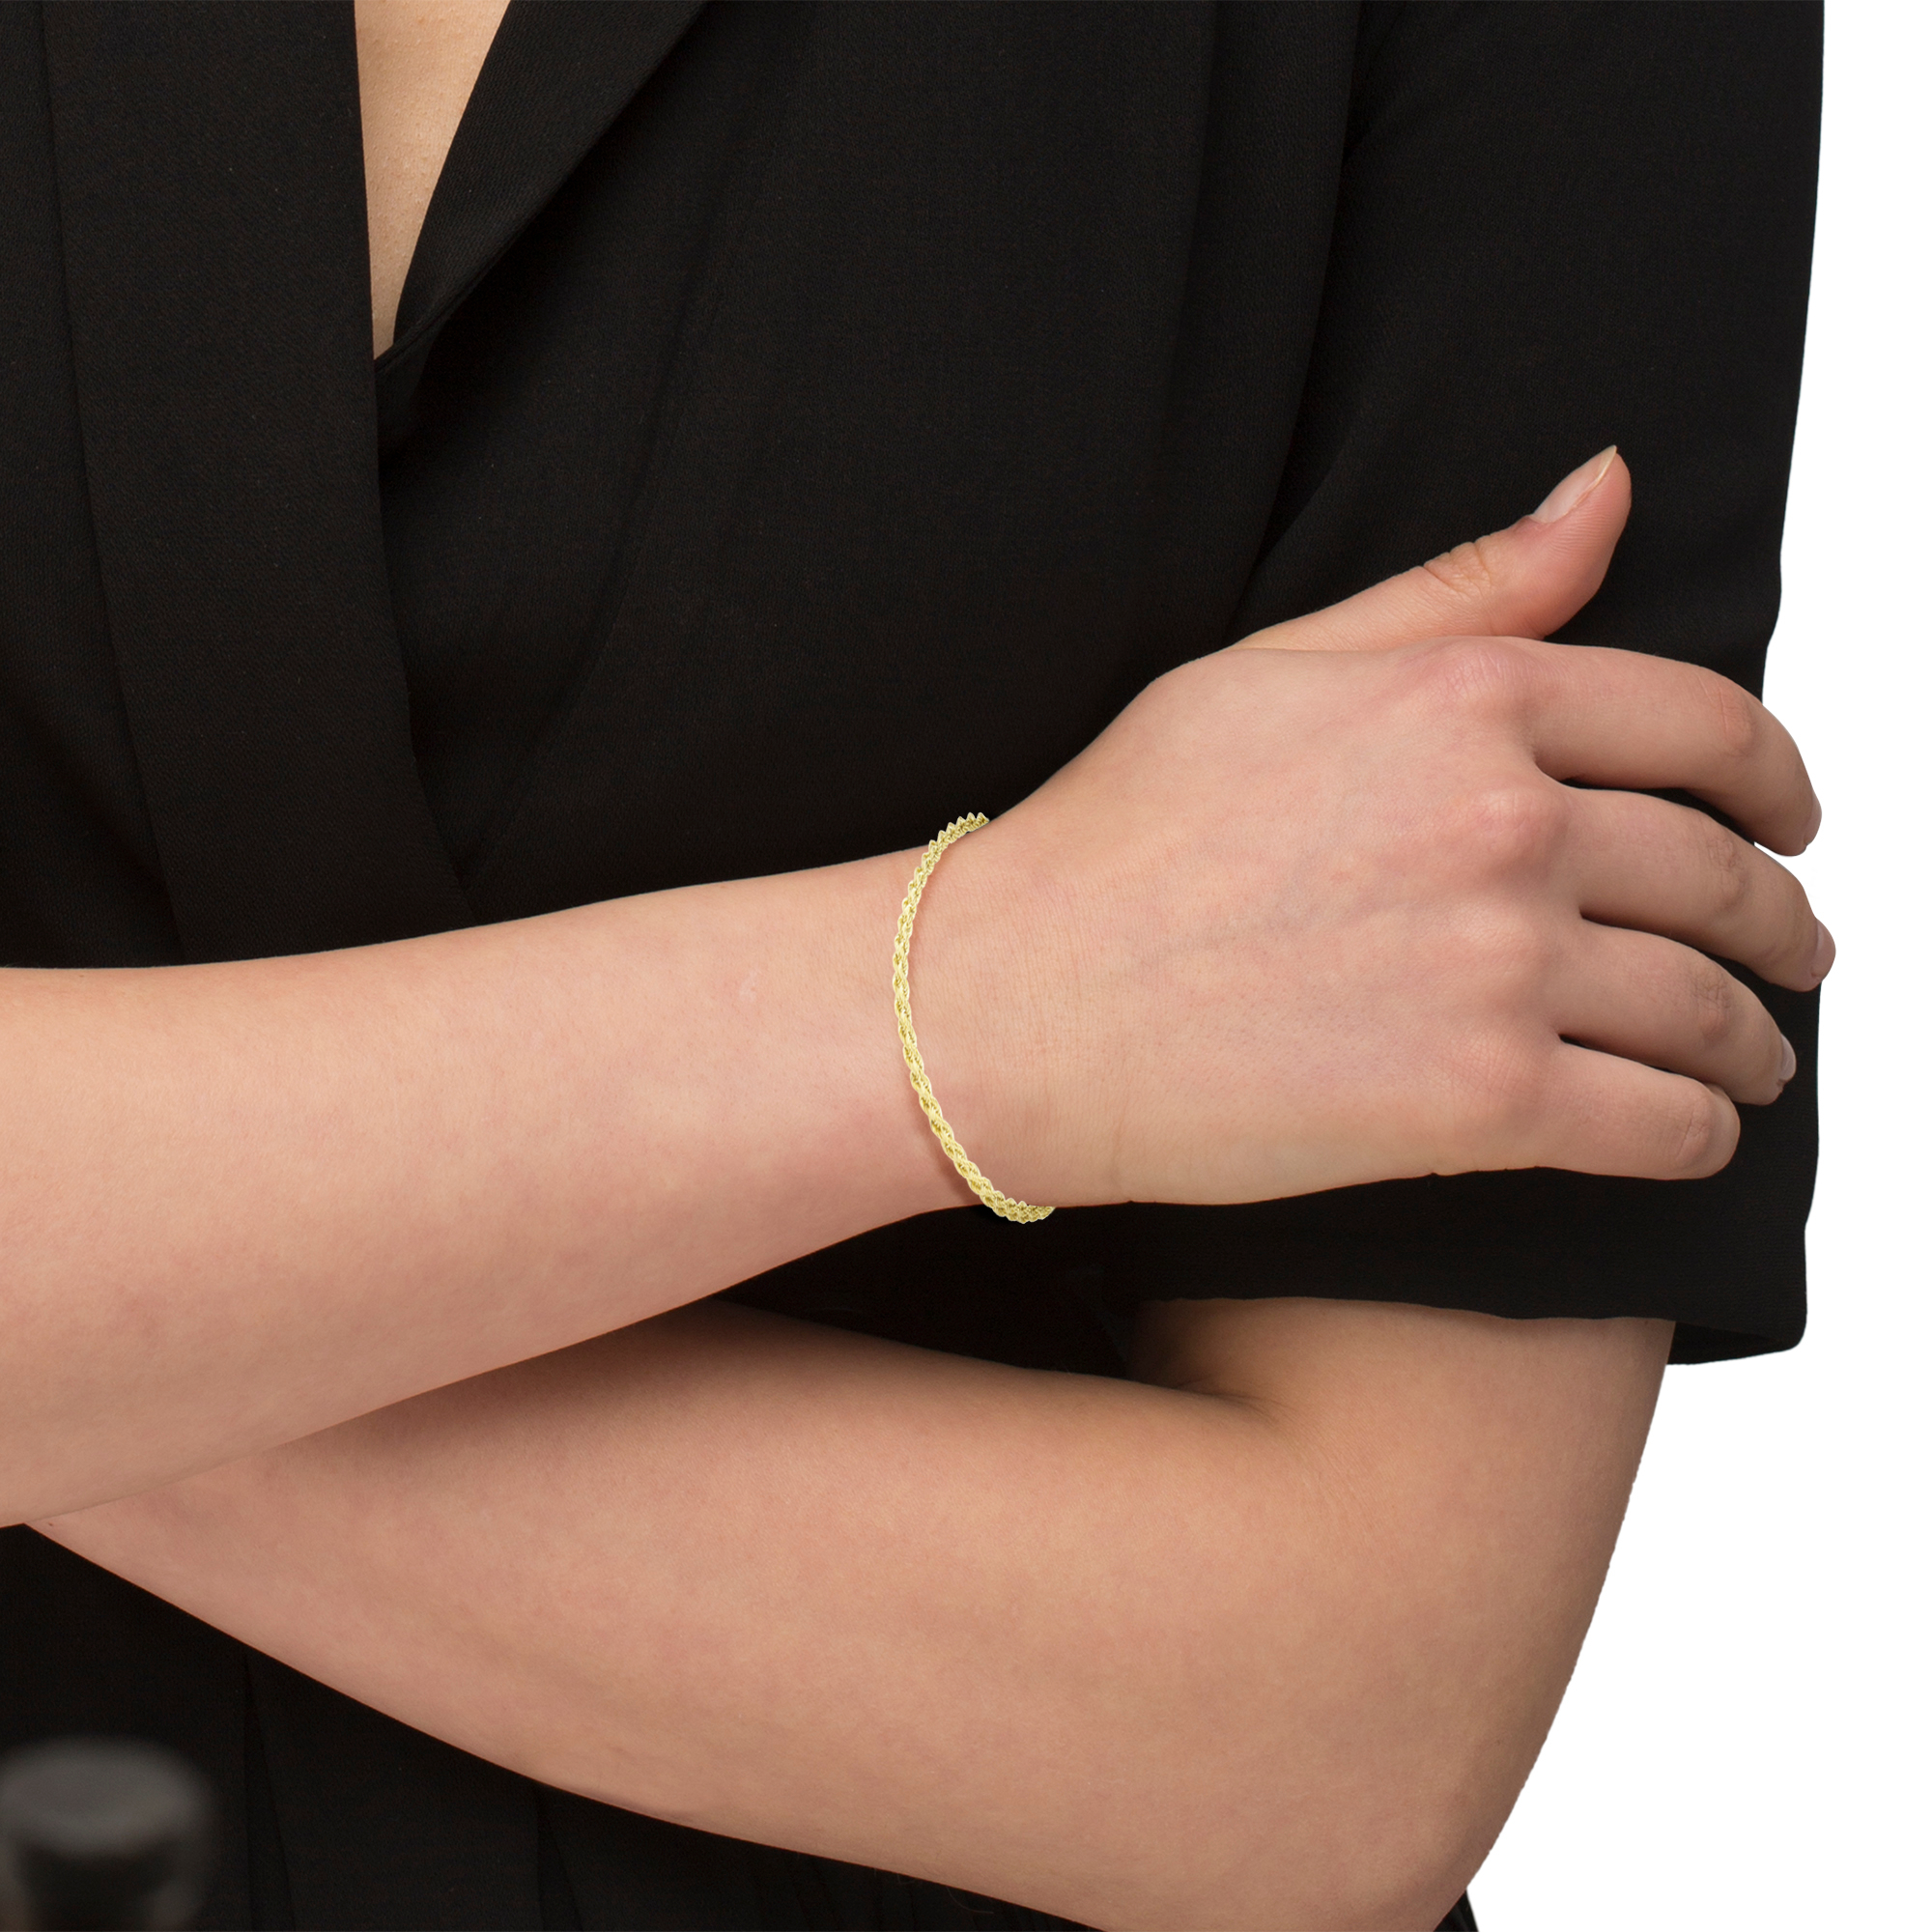 Armkette Gold 375/9 ct